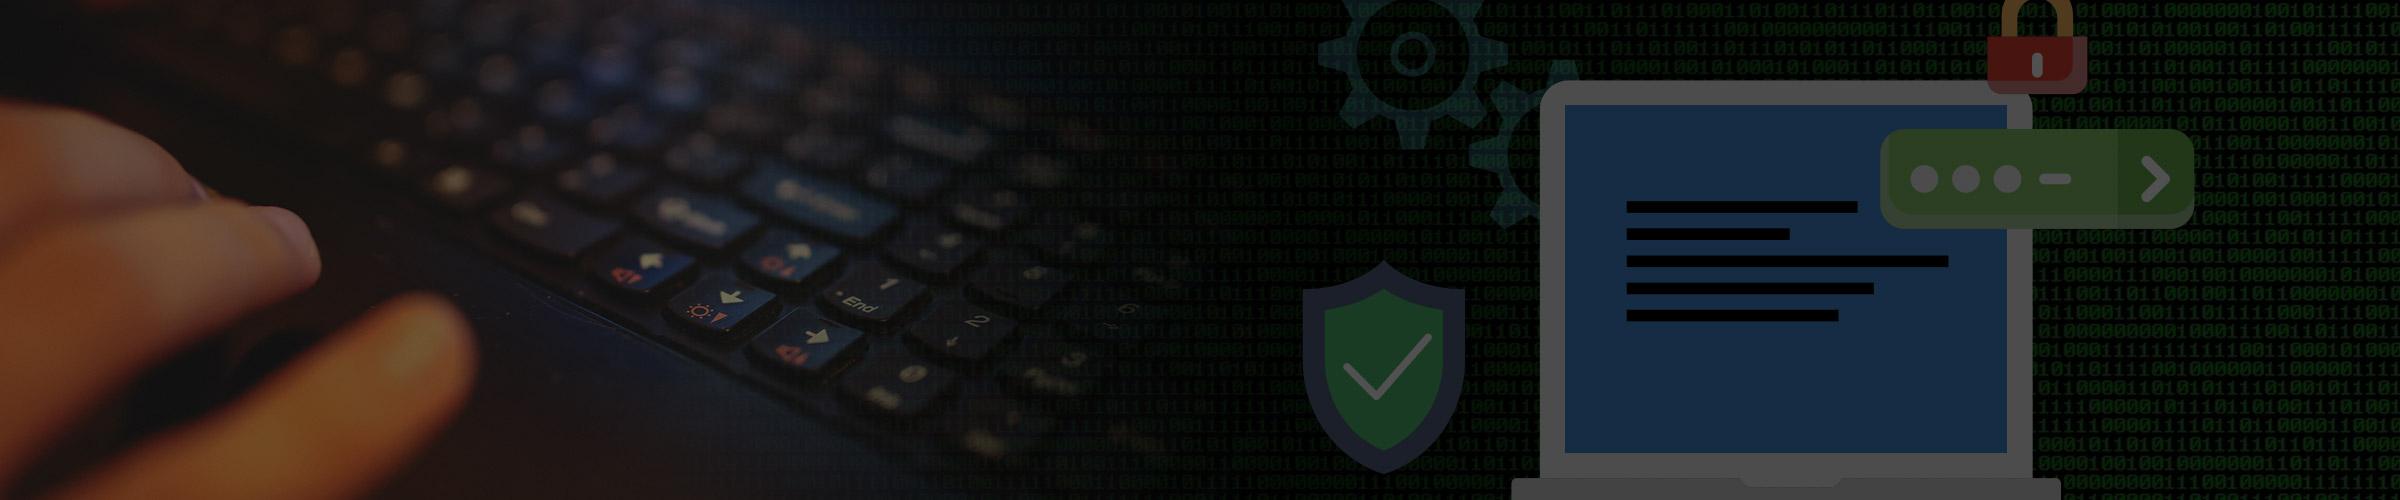 ethical_hacking_keyboard